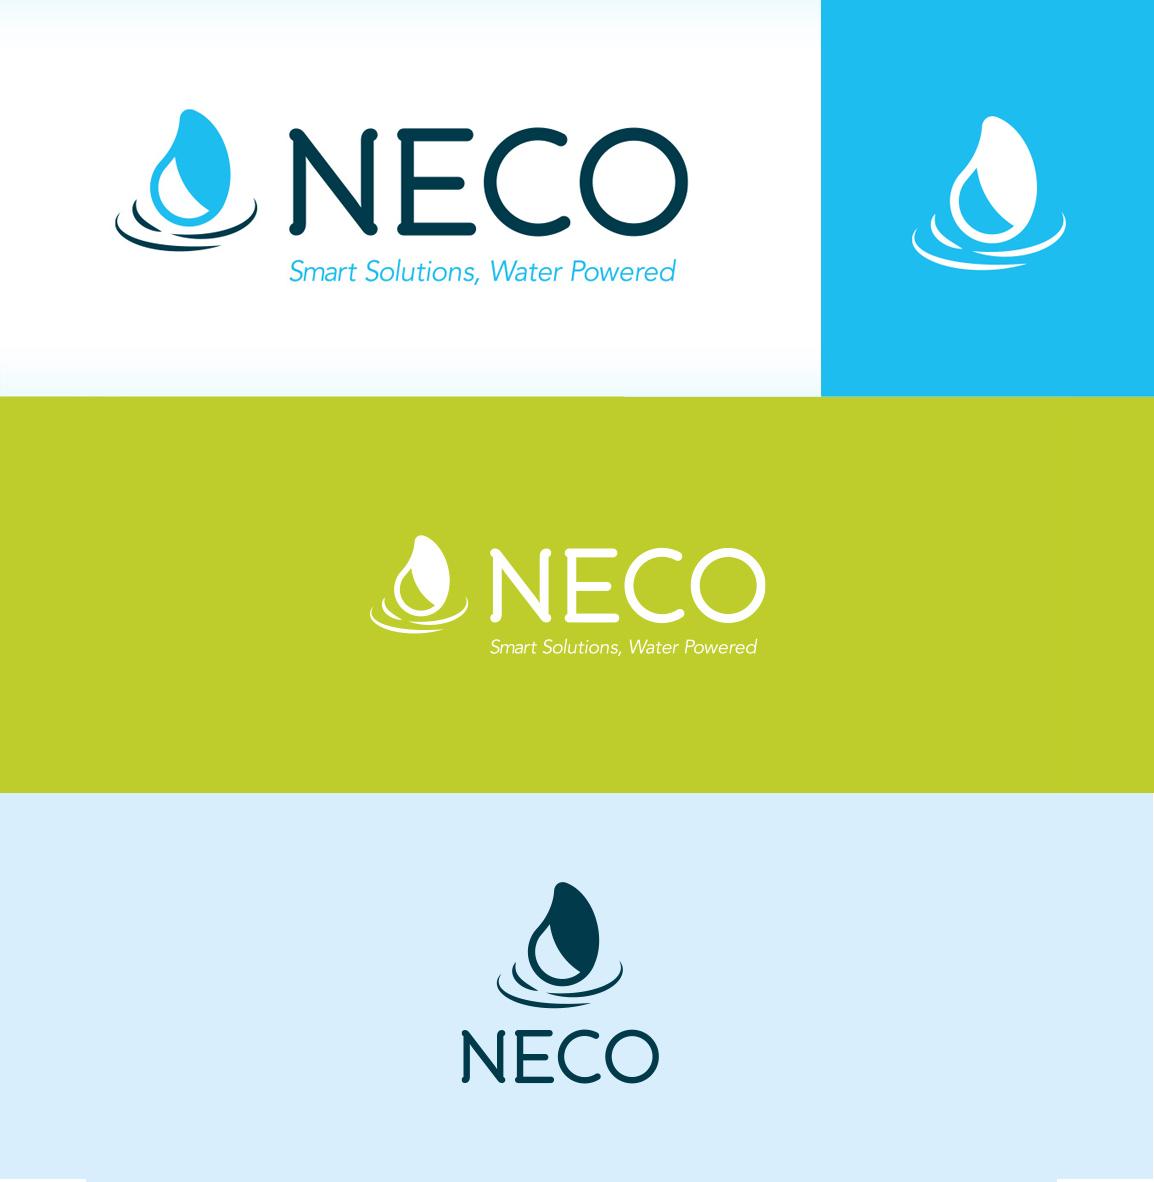 NECO-Branding-logos-versions-PHONE